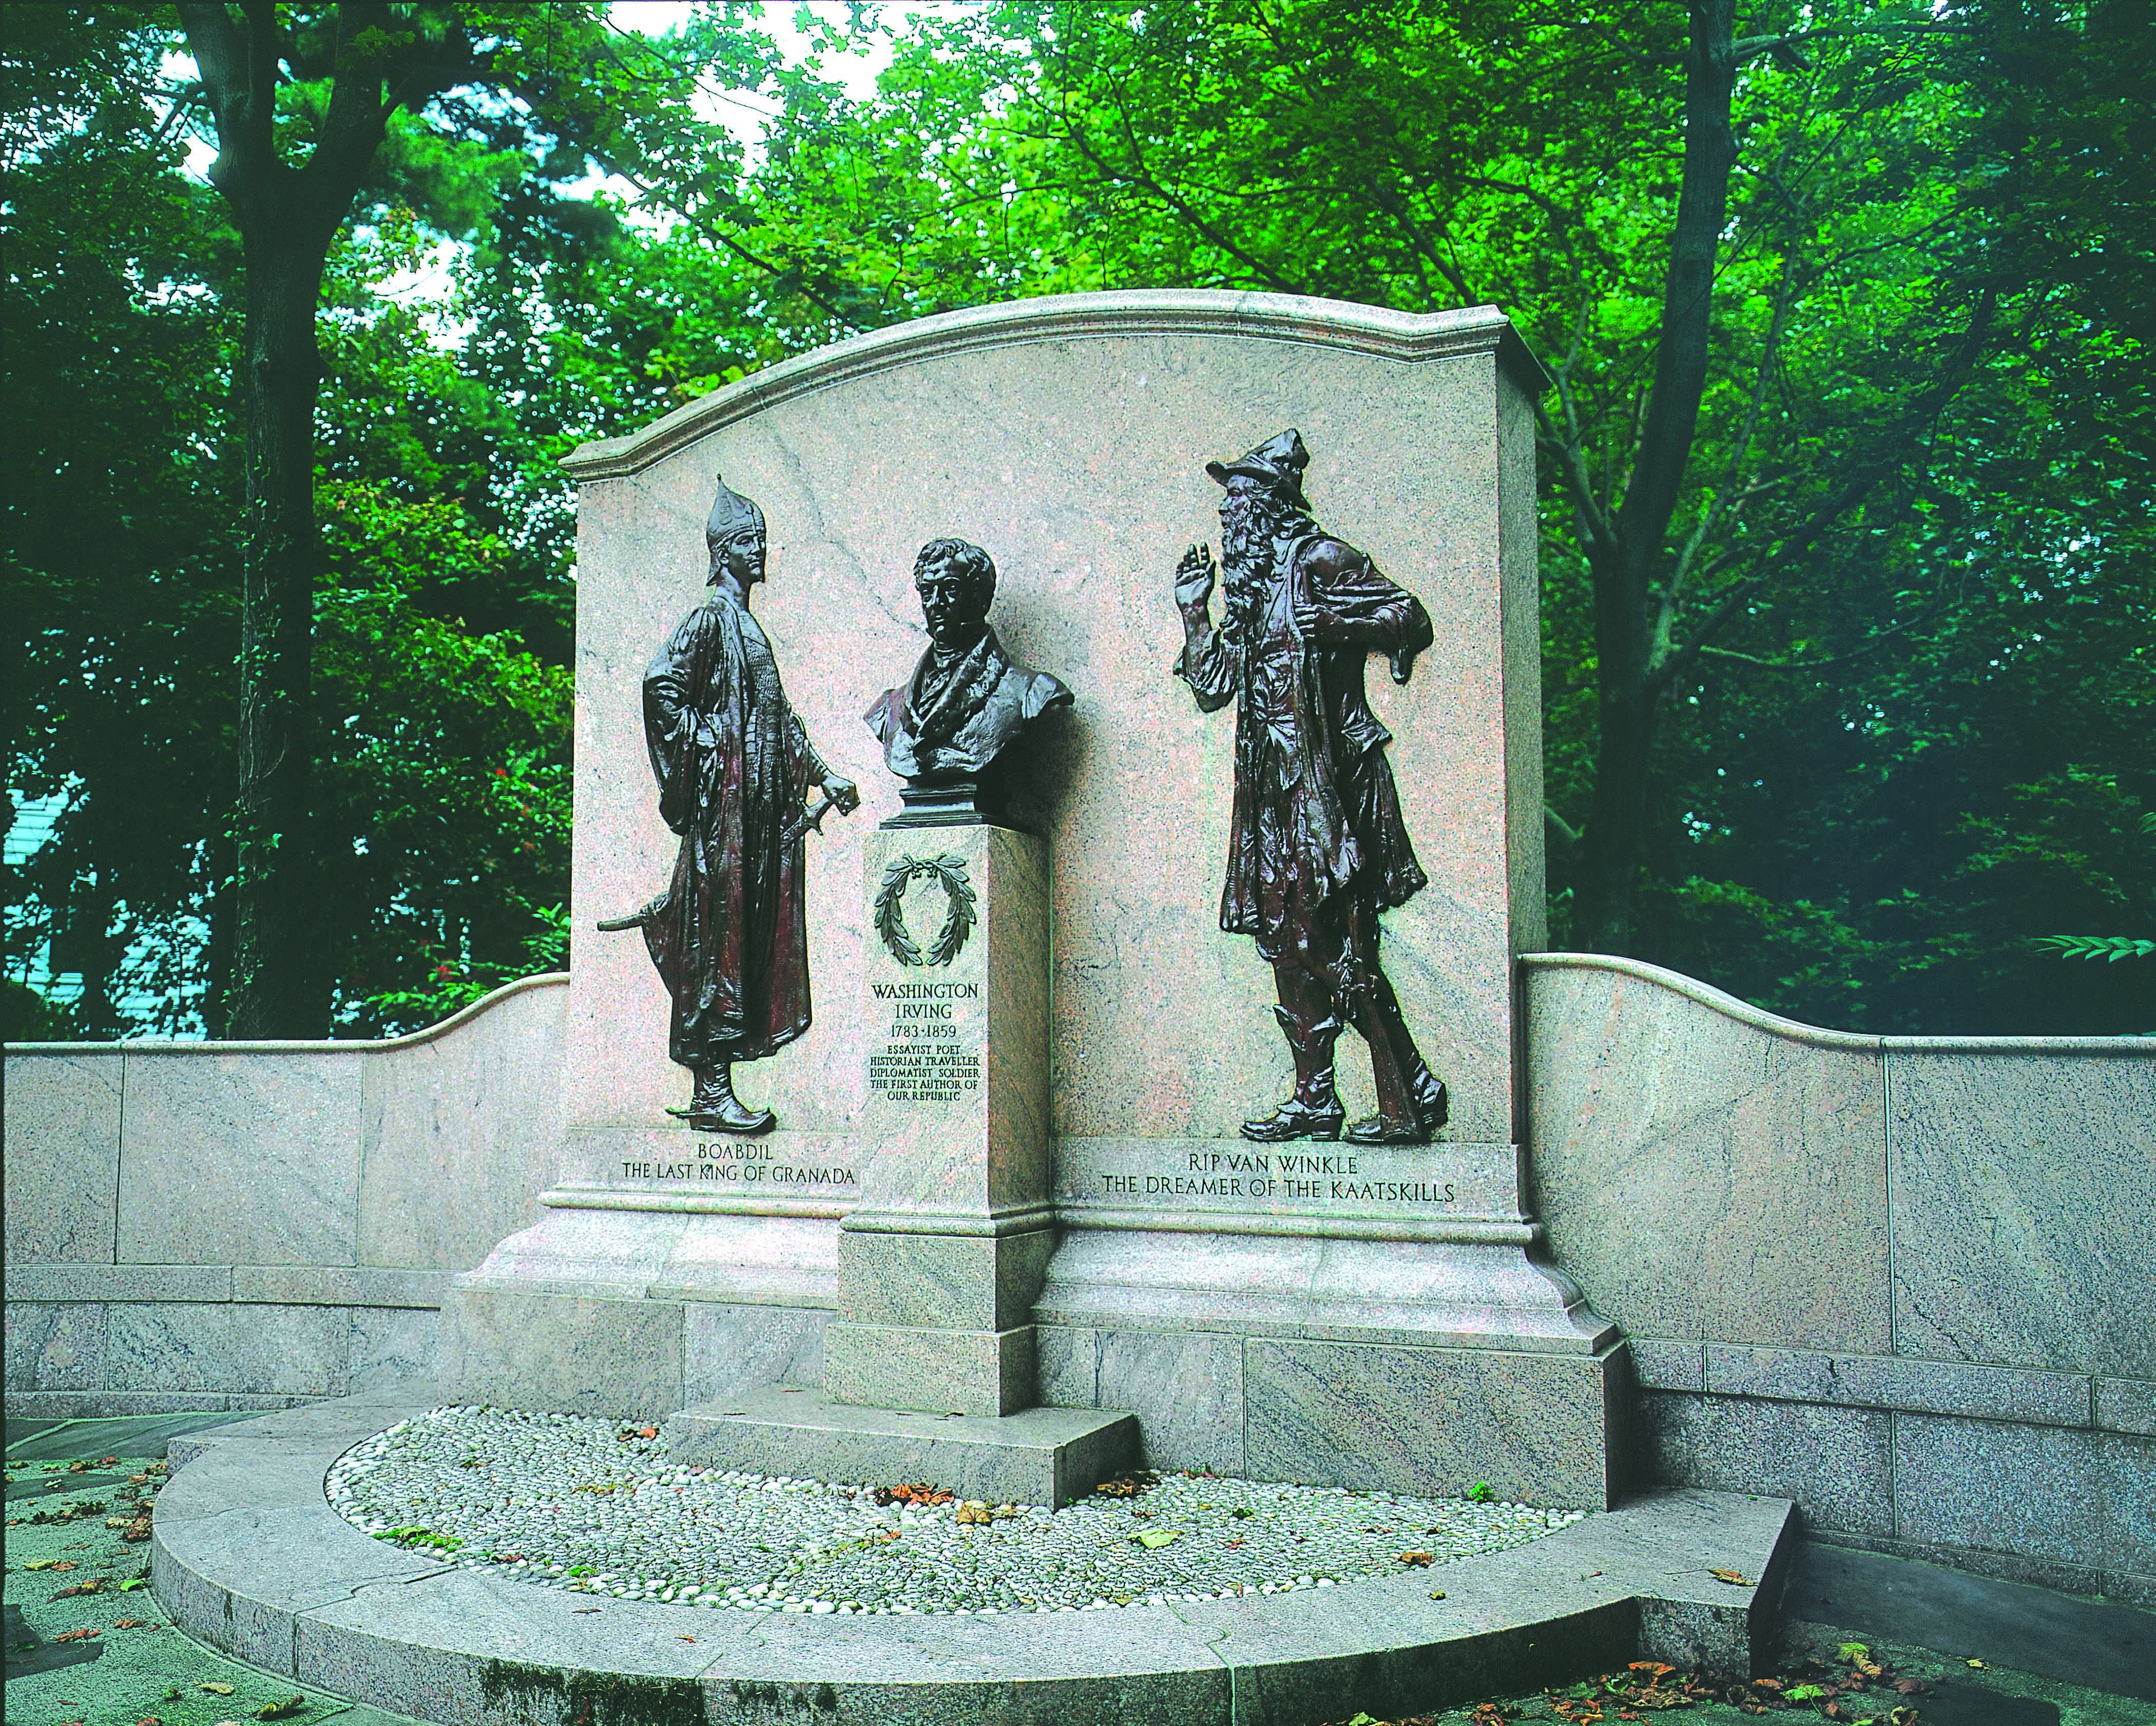 Washington Irving Memorial in 2000.